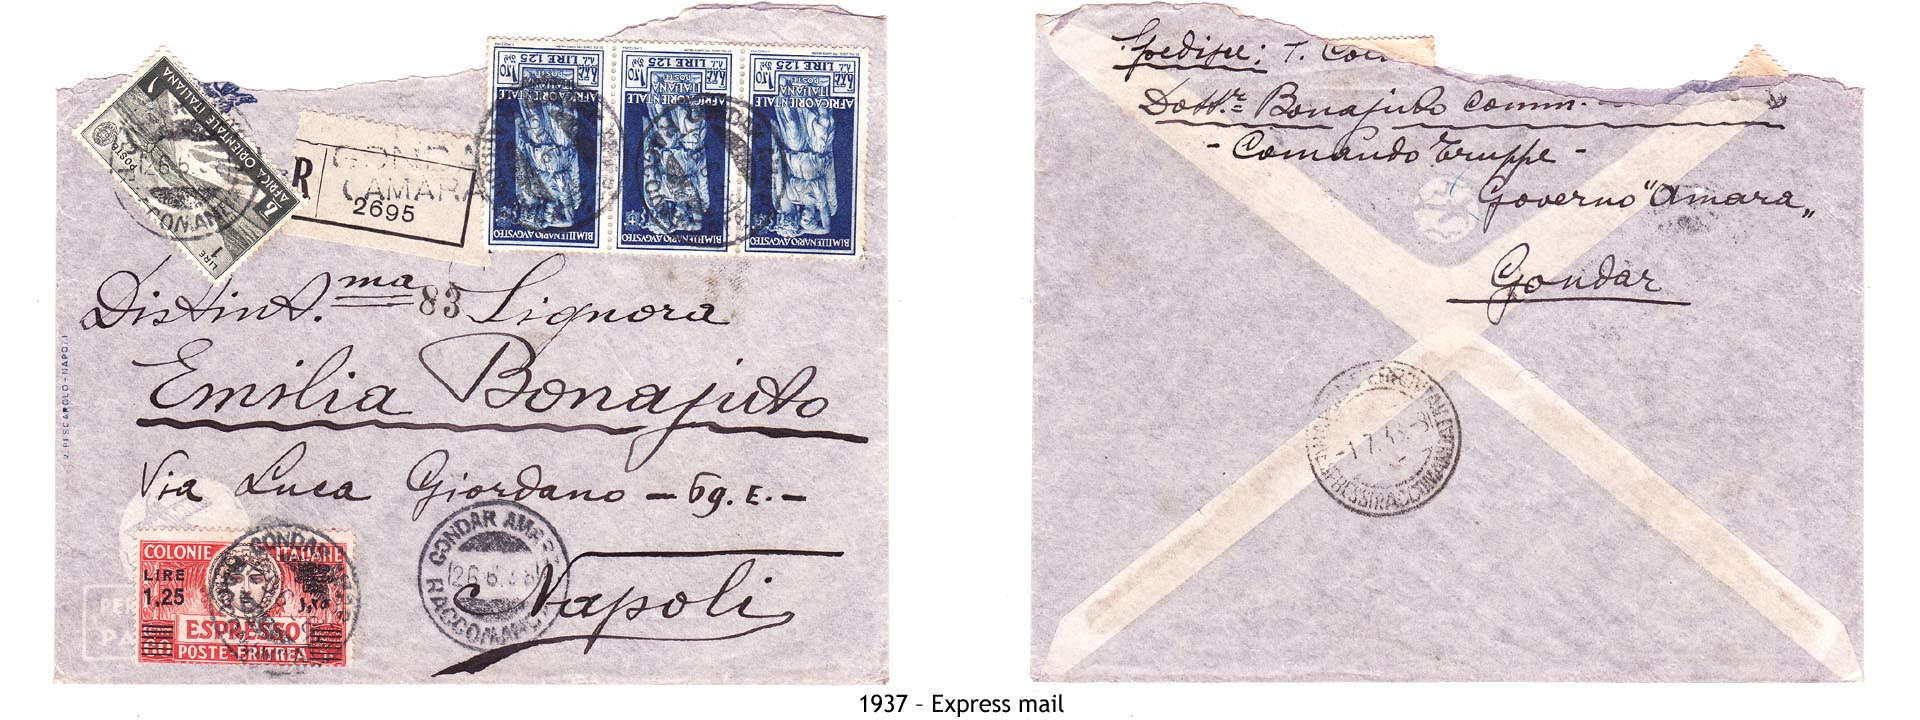 1937 – Eritrea Express mail